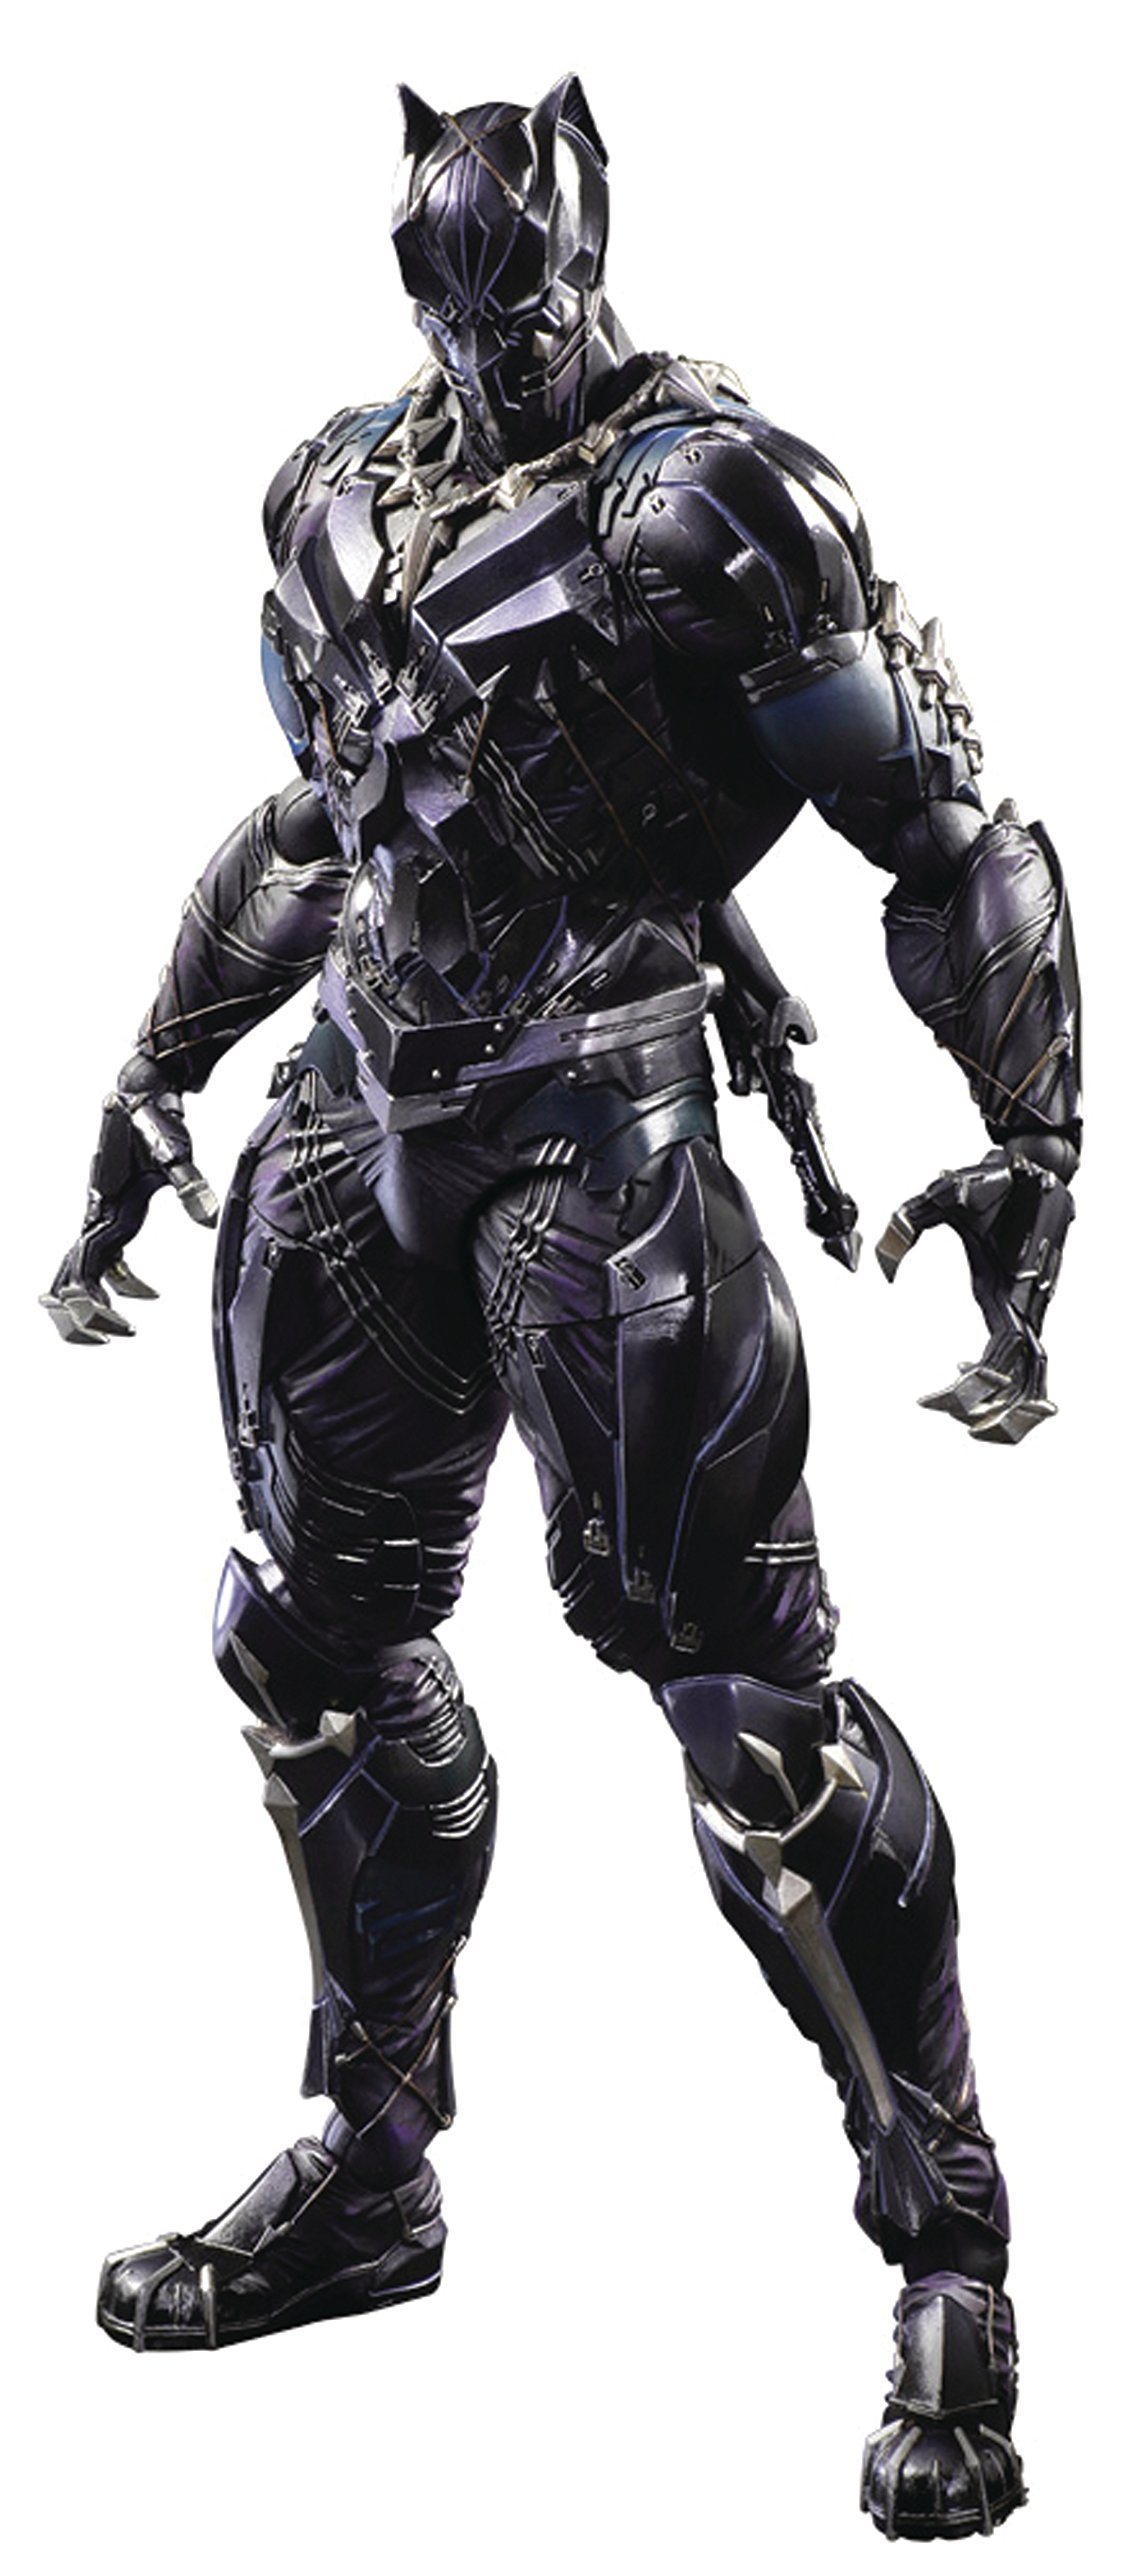 Square Enix Marvel Universe Variant Play Arts Kai: Black Panther Action Figure